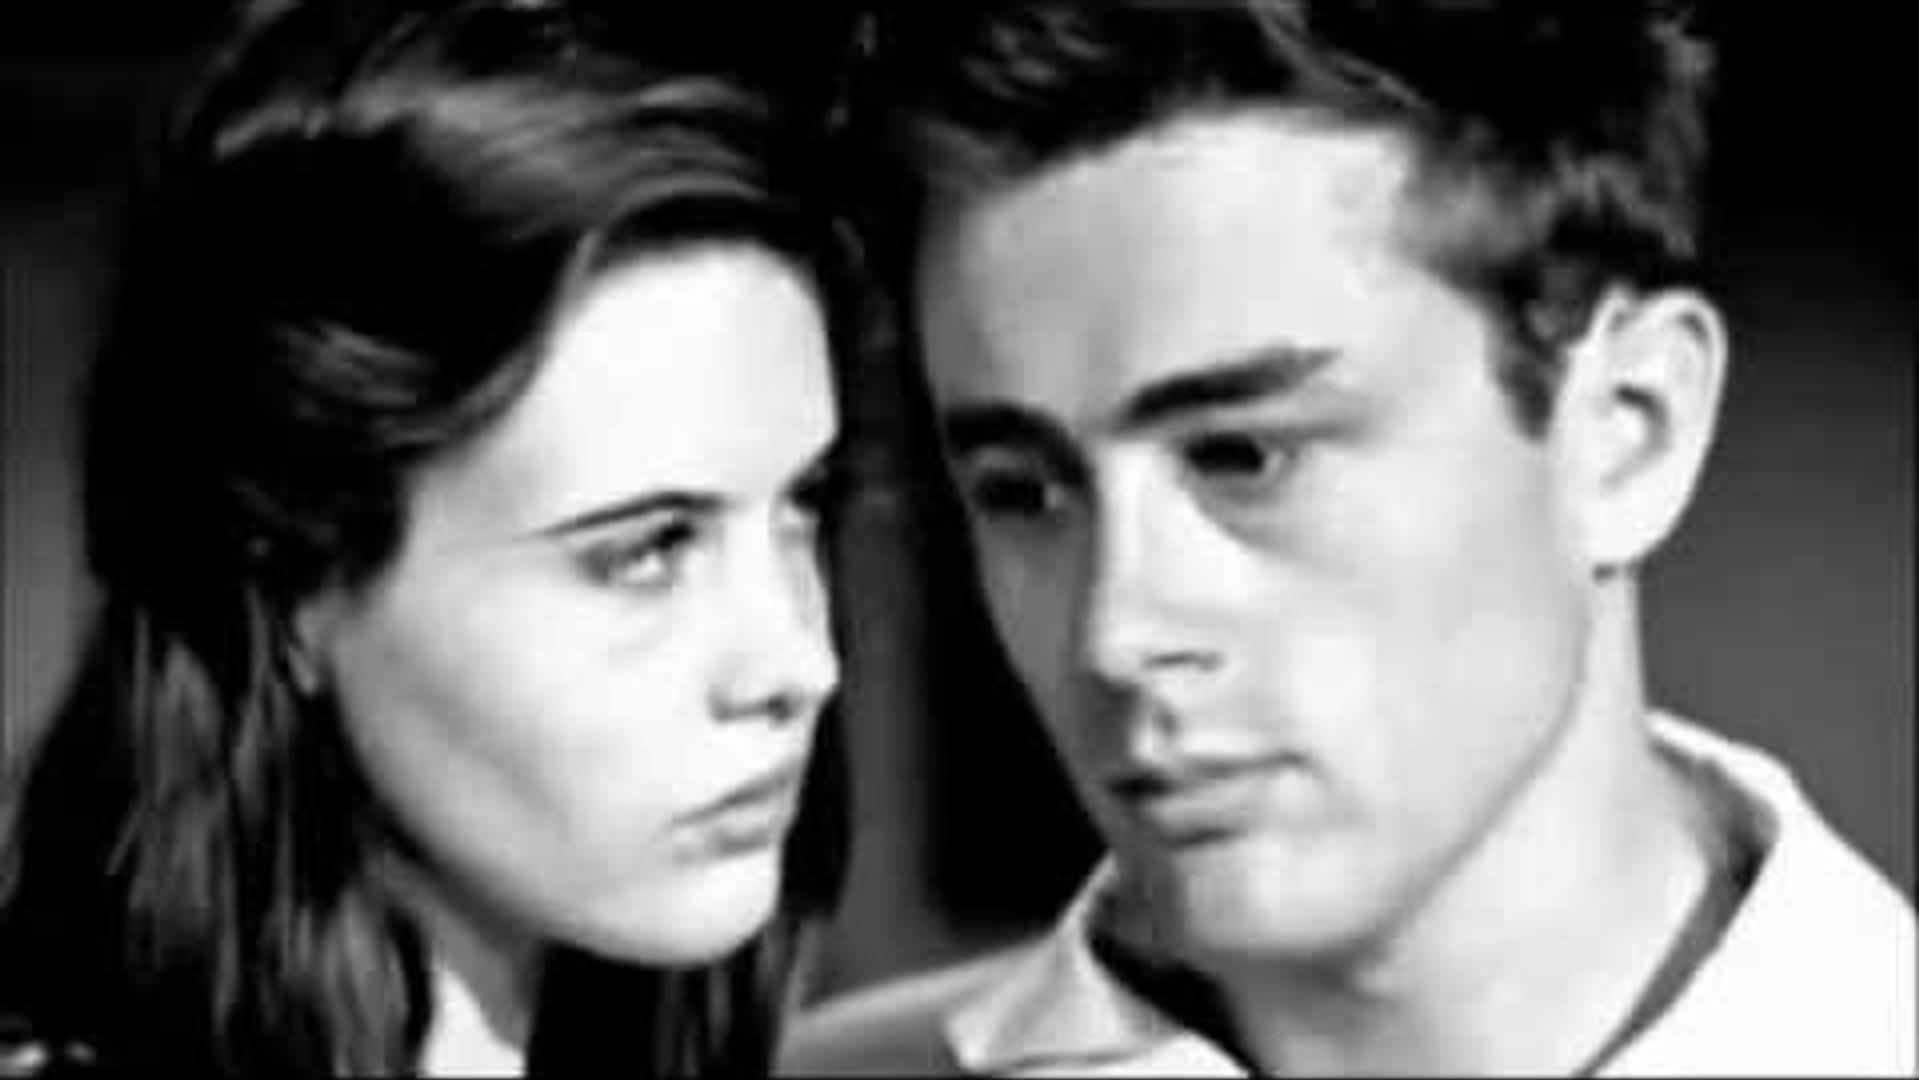 The Underground Youth - Jim & Marianne